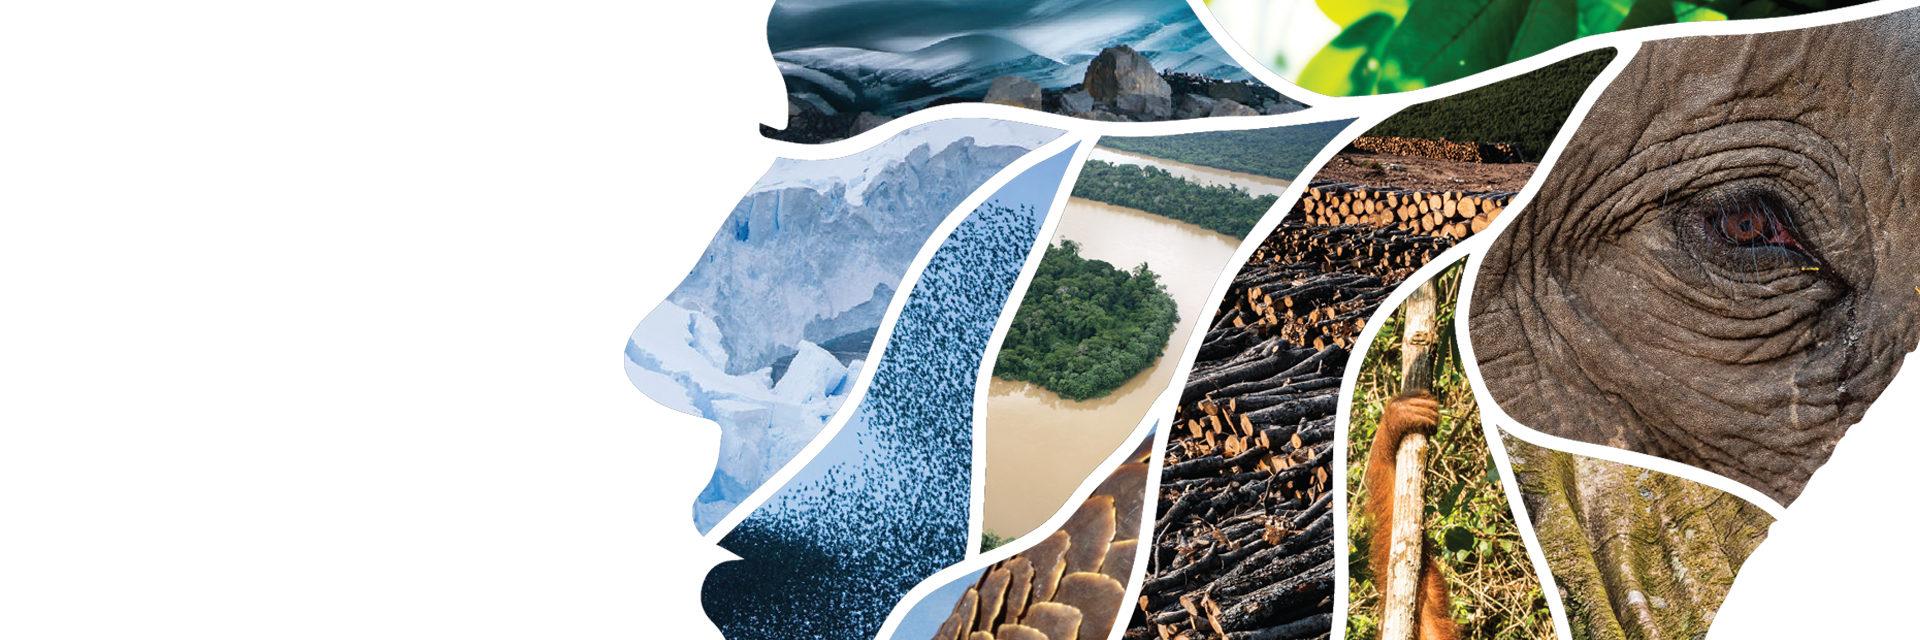 WWF Pandemics banner